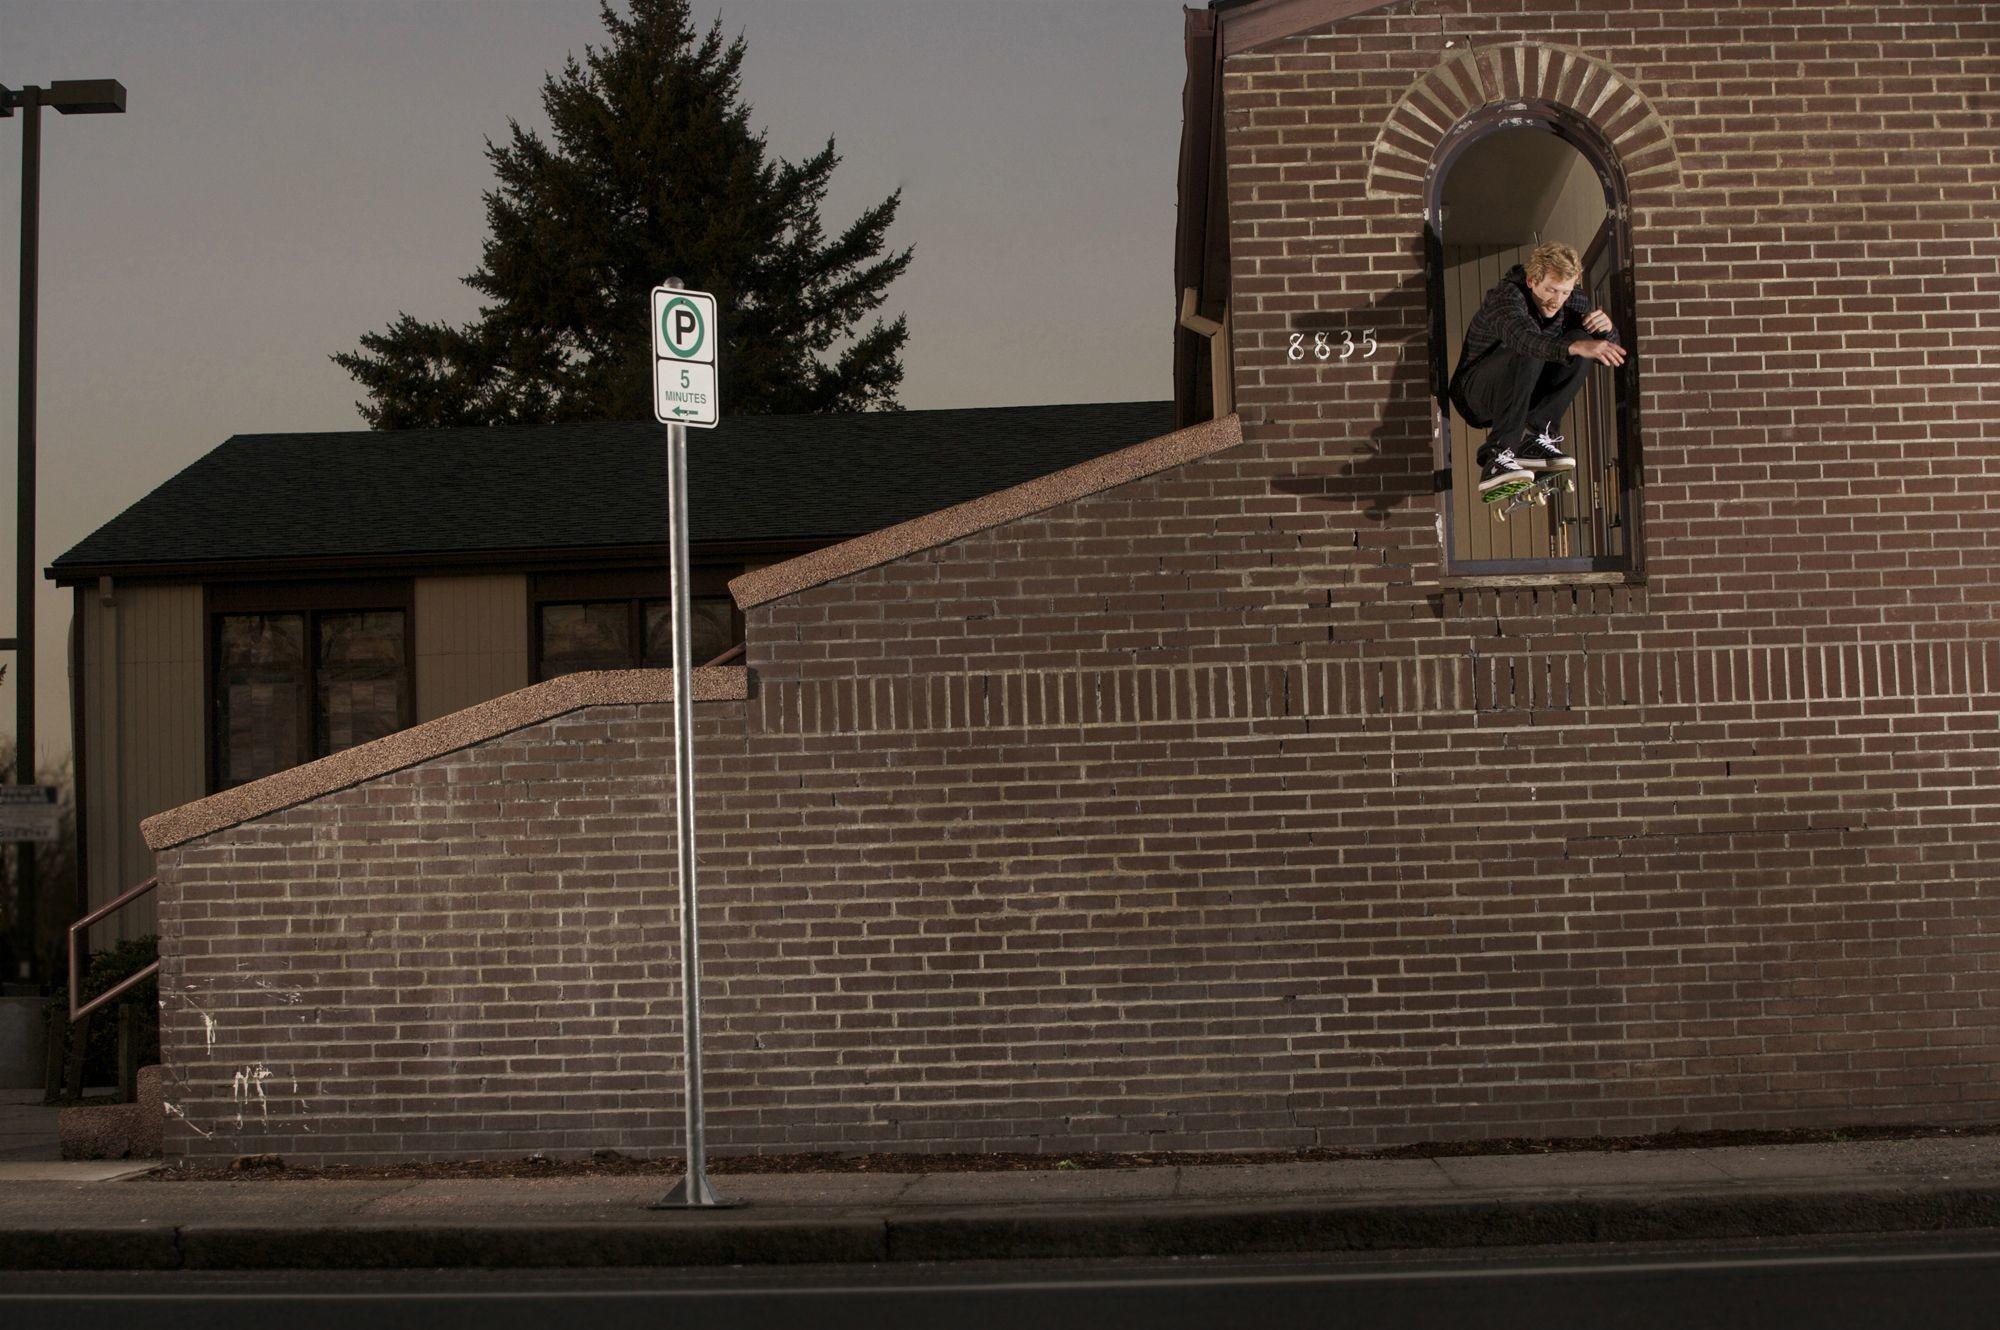 Dept. of Skateboarding » Skate Paparazzi